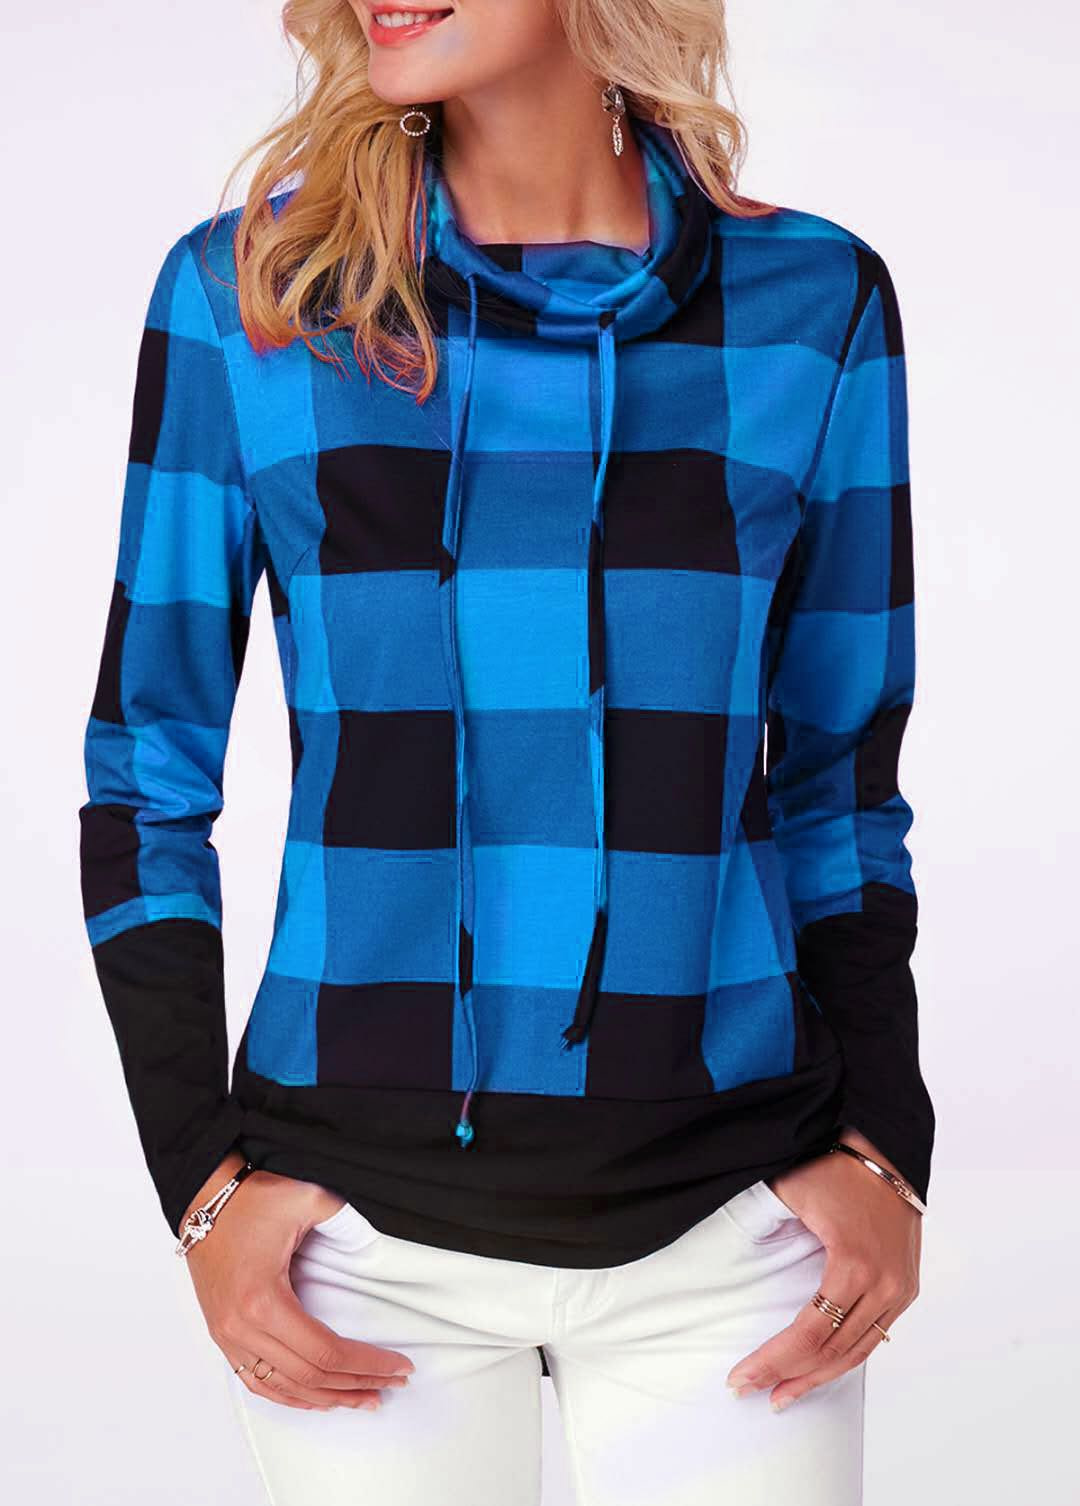 Women's Plaid Print Turtleneck Hoodie, Casual Long Sleeve Women's Plus Size Sweatshirt 9